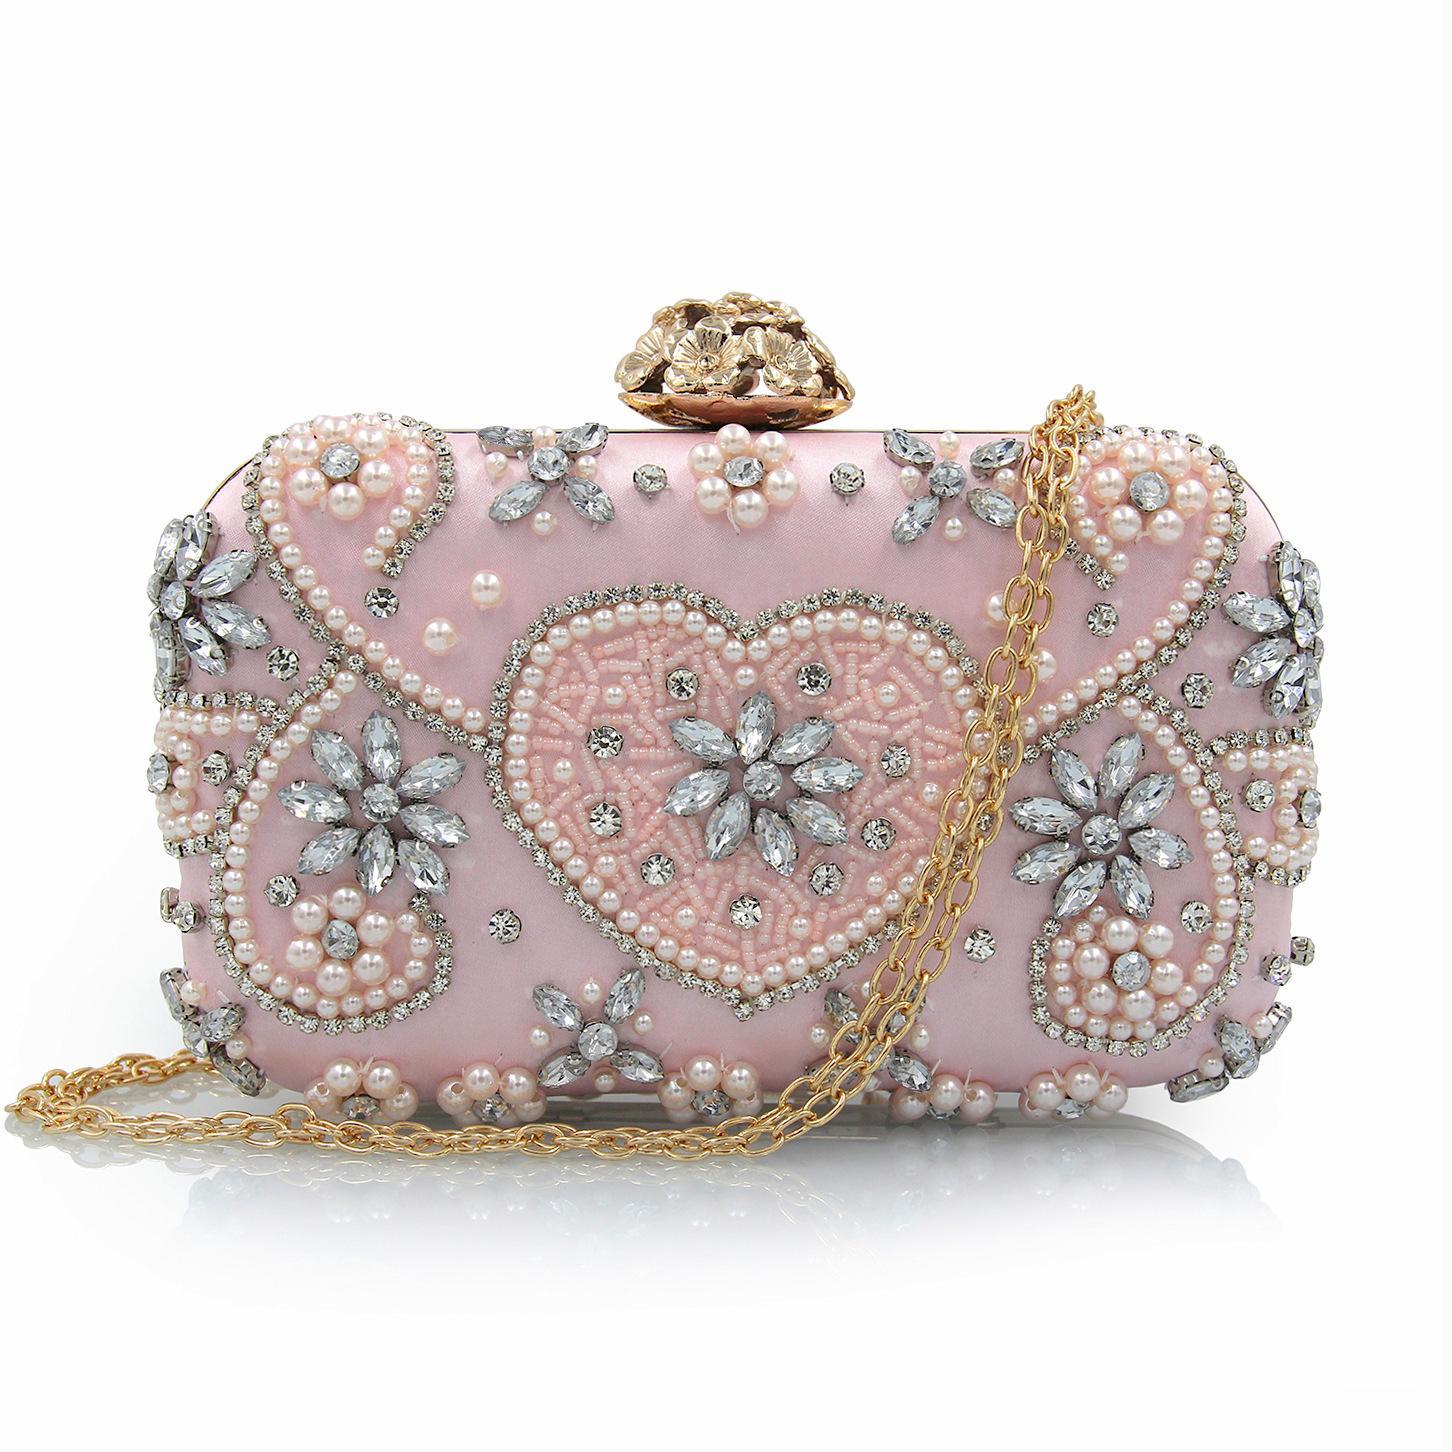 88650d329676 Fashion Crystal Clutches Evening Bags Women Party Purse Luxury Clutch Bag  Ladies Night Bags Wedding Bag Chain Handbags Bridal Garment Bags Bridal  Shower ...